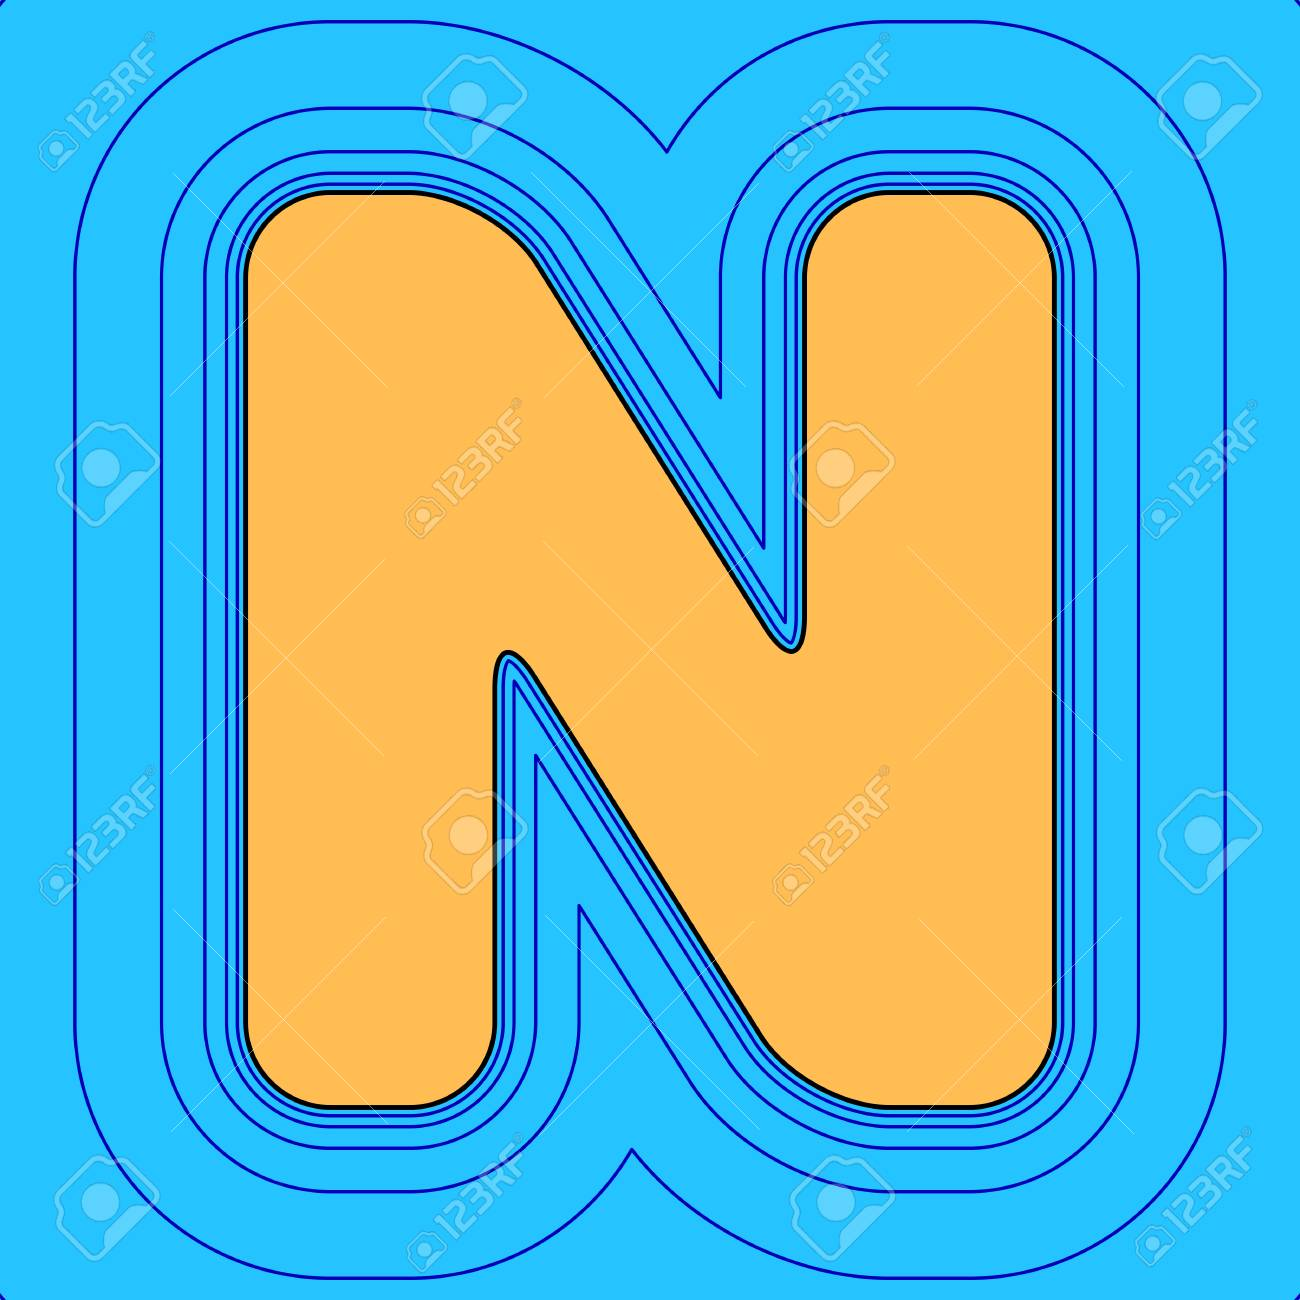 Letter n sign design template element sand color icon with black letter n sign design template element sand color icon with black contour and equidistant blue maxwellsz